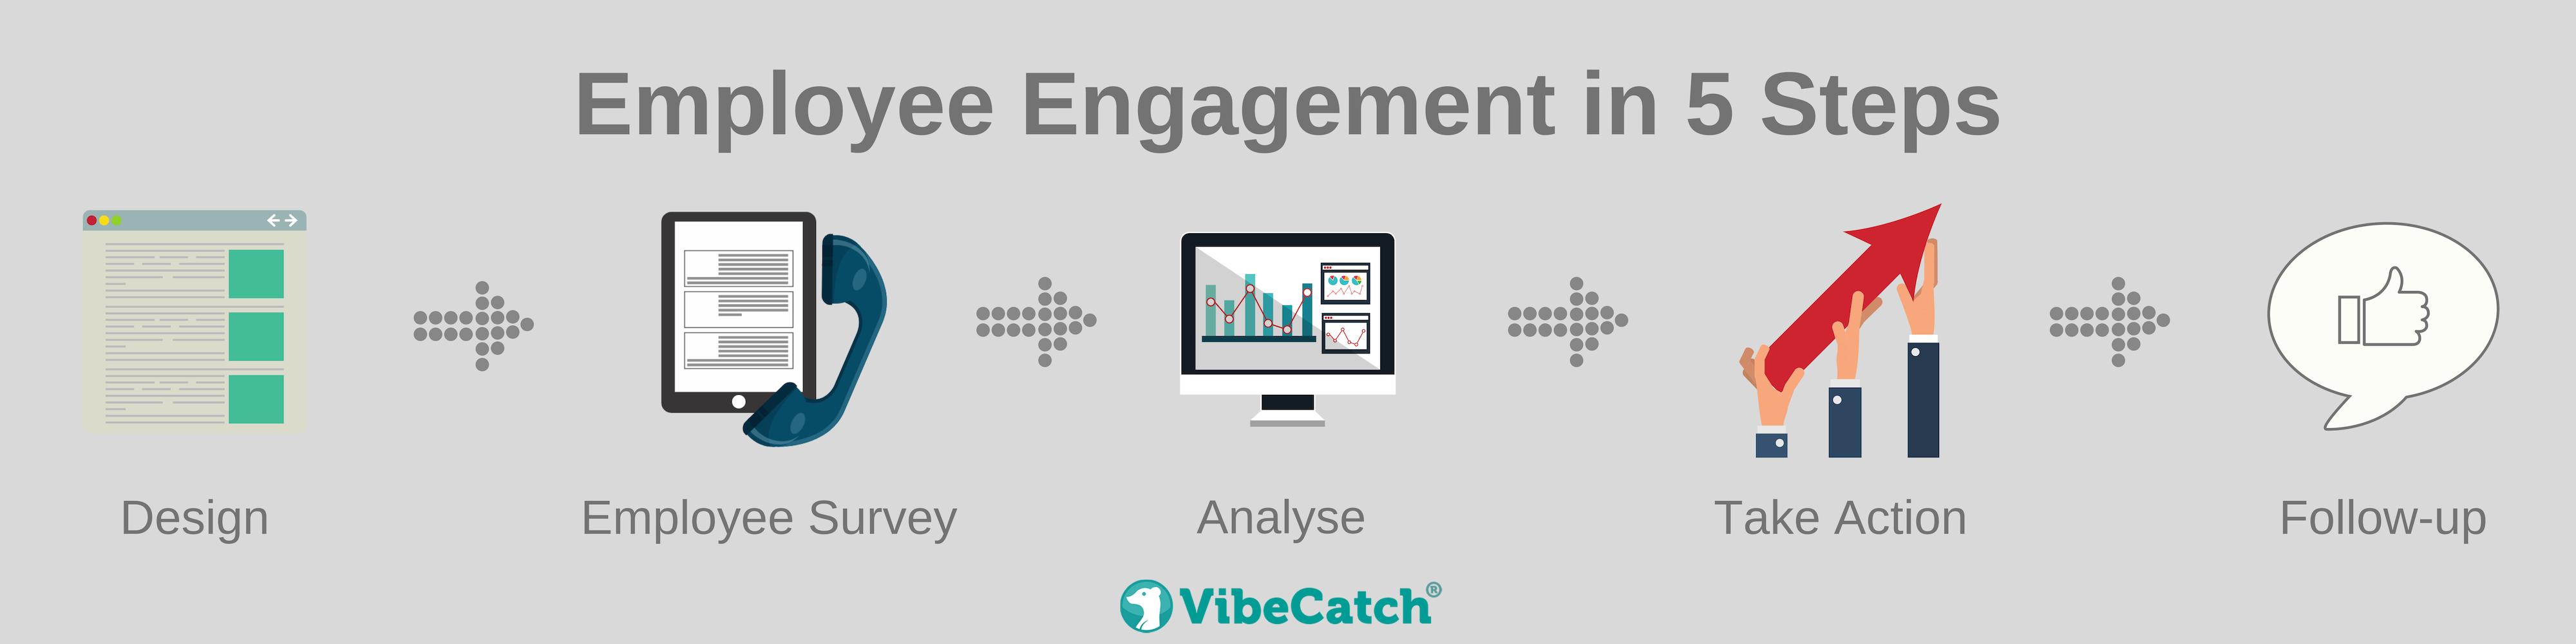 Employee Engagement process